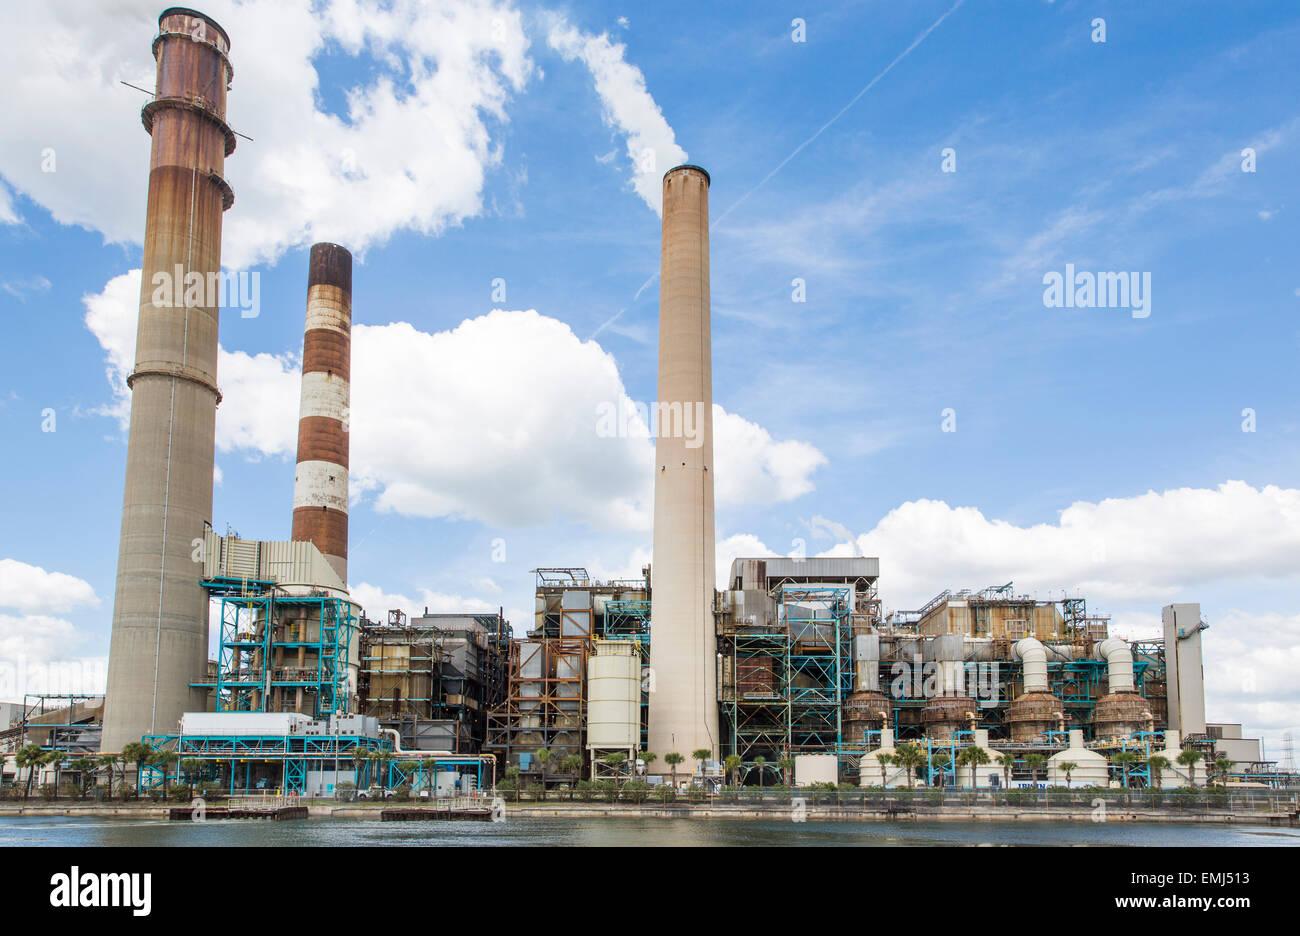 Big Bend Power Station, Tampa Electric, Apollo beach Florida. - Stock Image